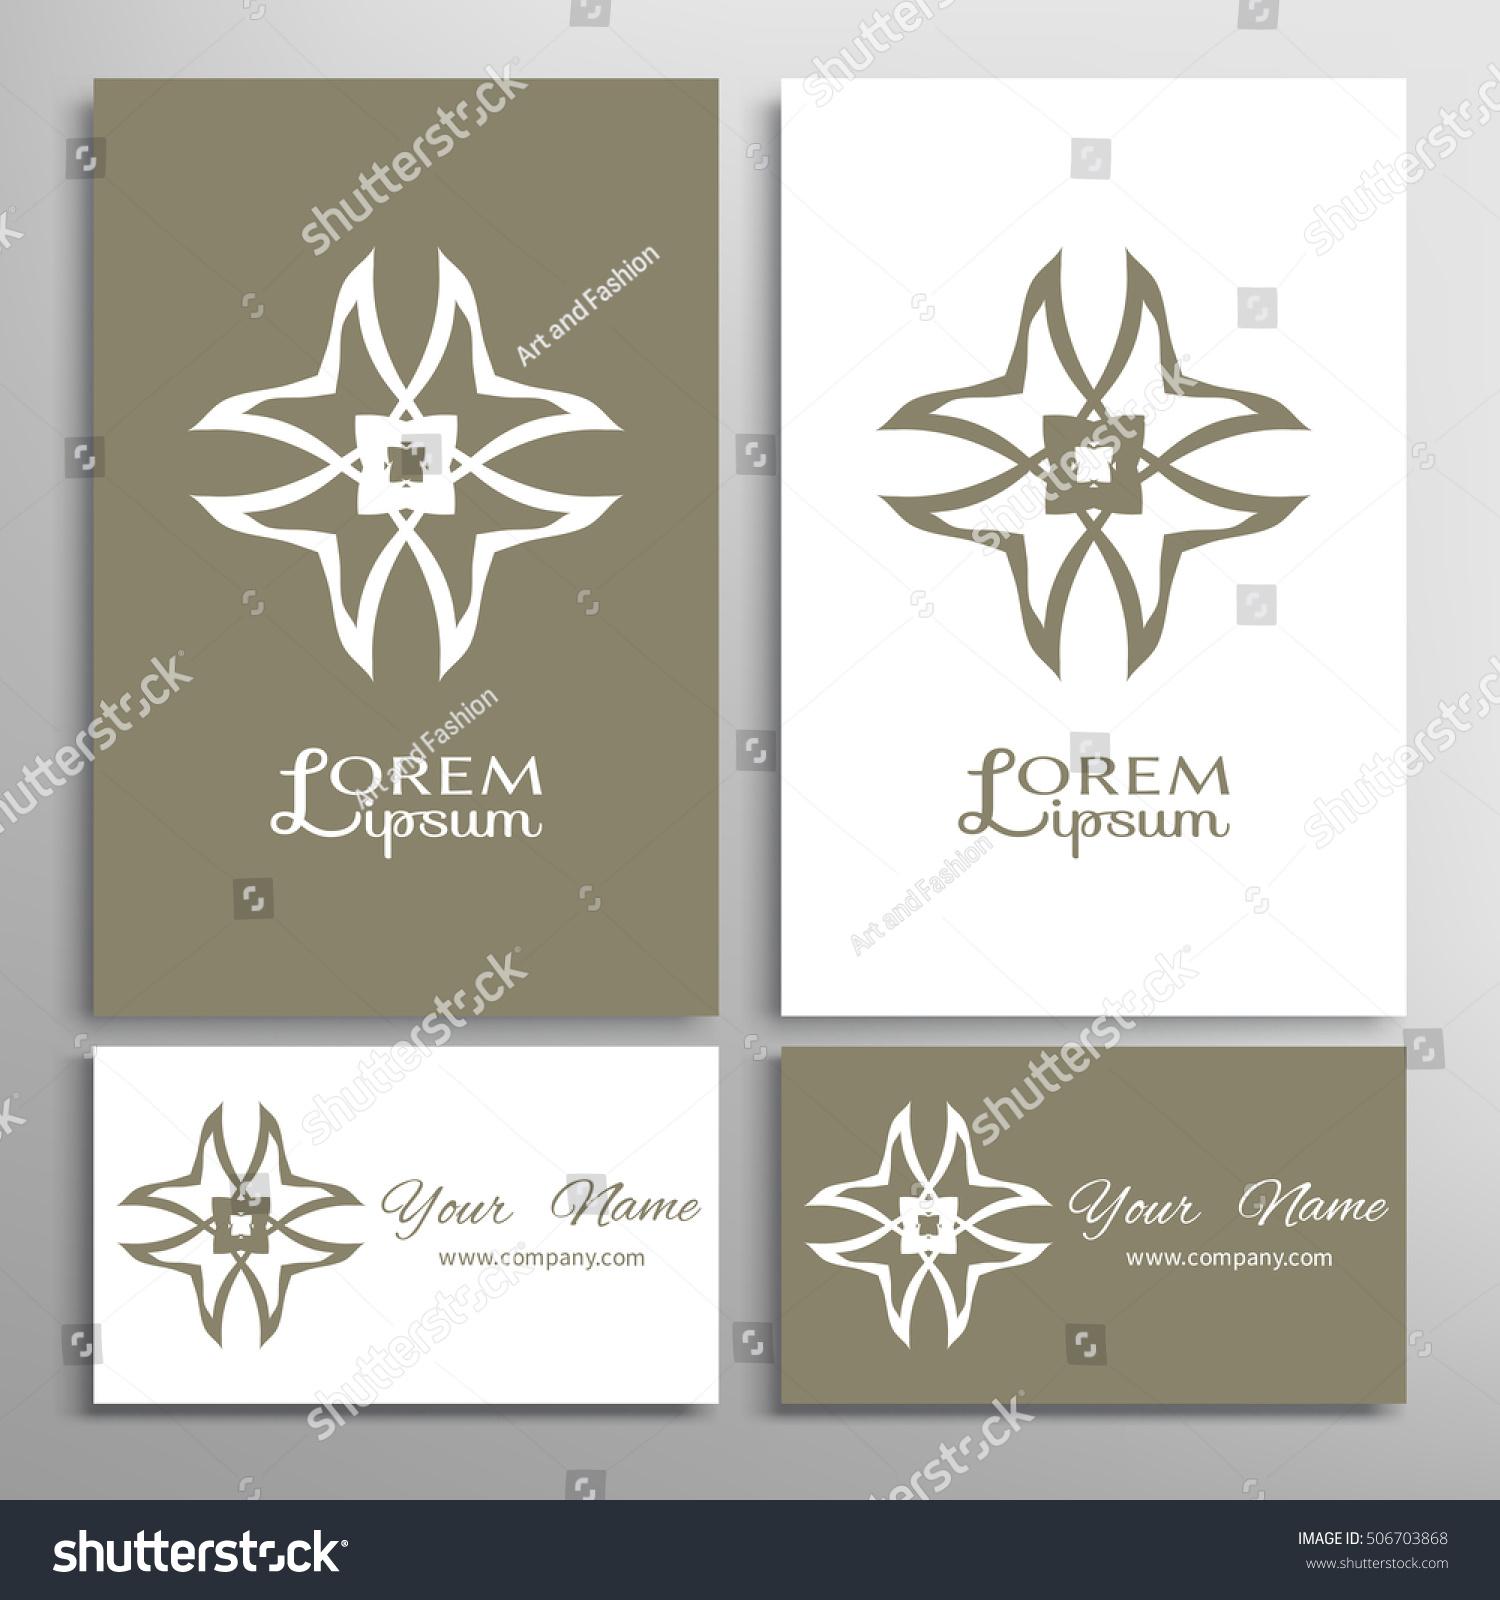 vector geometric design element logo icon stock vector